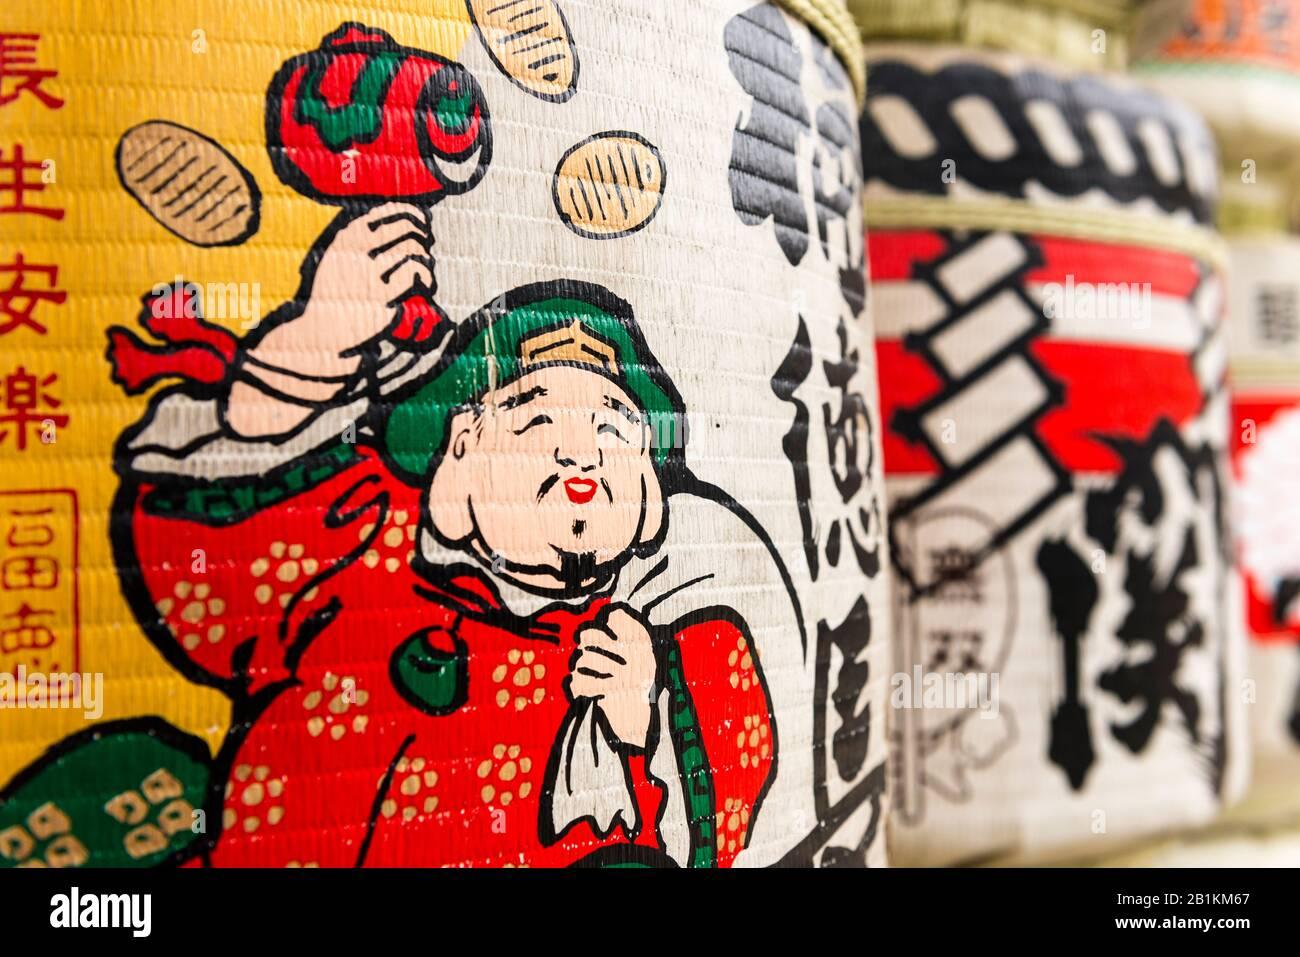 Sake barrels covered in Japanese art, at Kushida-jinja,  a Shinto shrine. Hakata-ku Old Town, Fukuoka. Japan Stock Photo